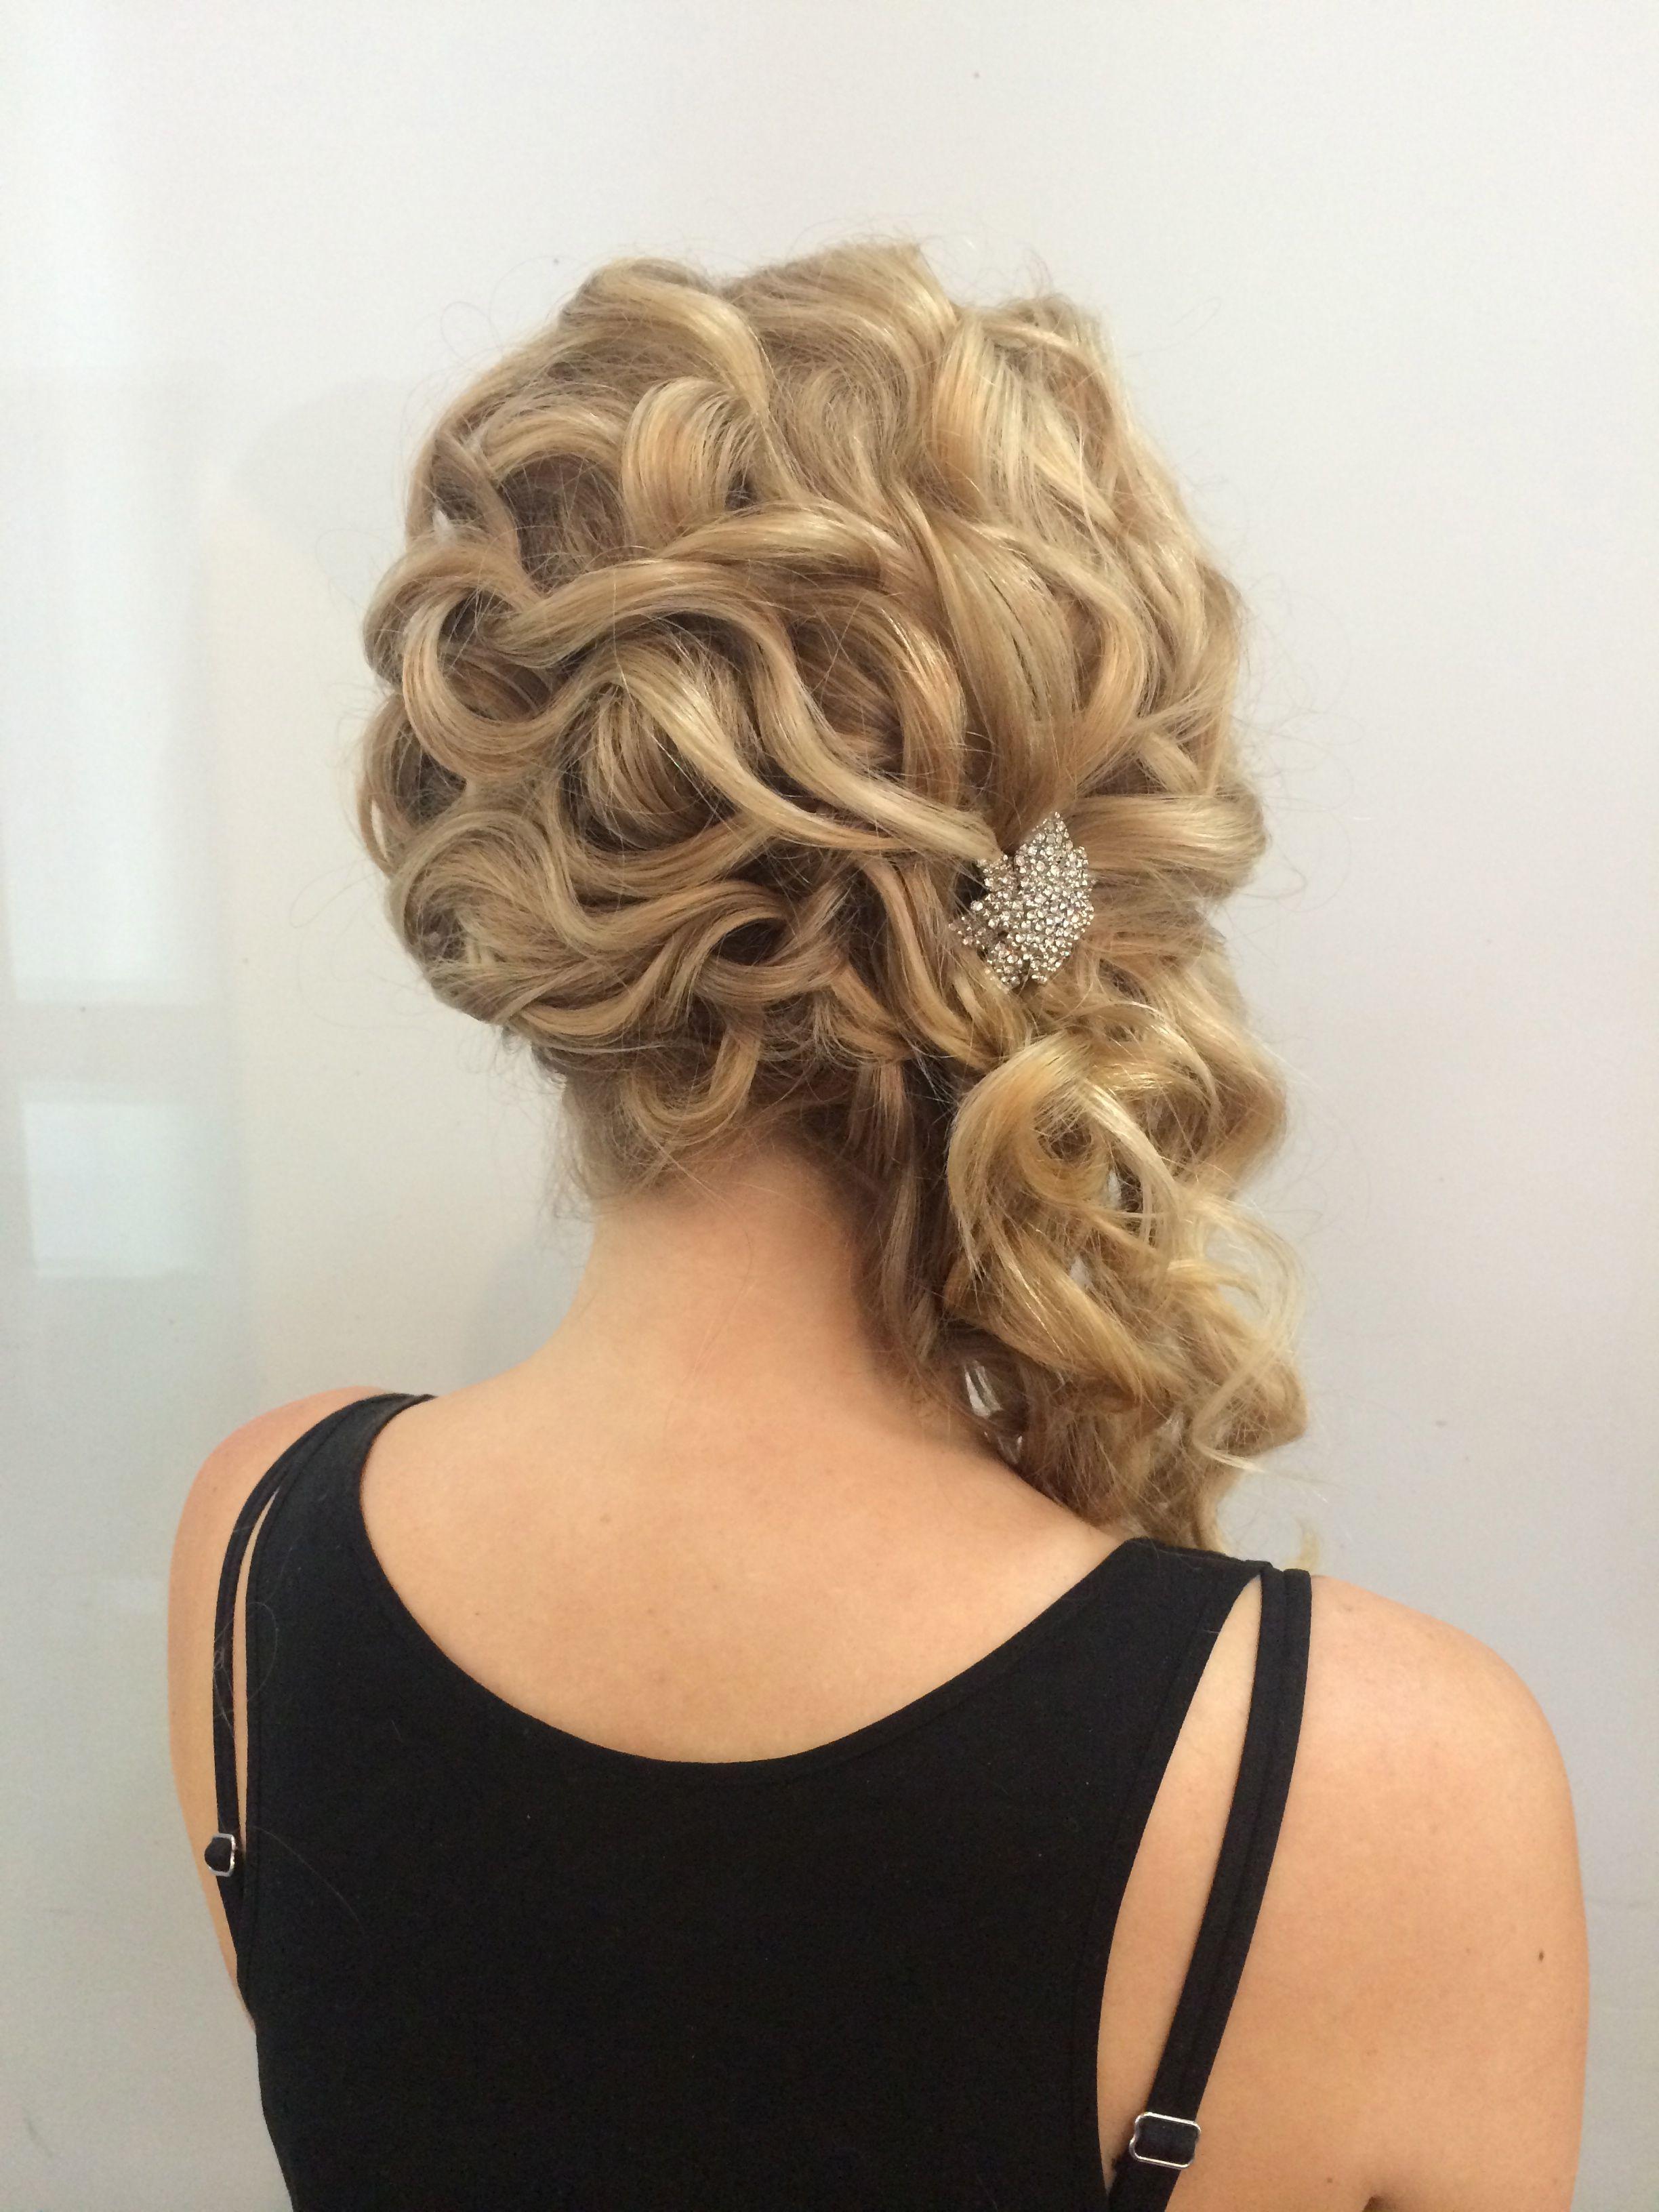 high detail pinned upstyle #bride #bridalhair #upstyle #updo #salon #hair #bridalhair # ...